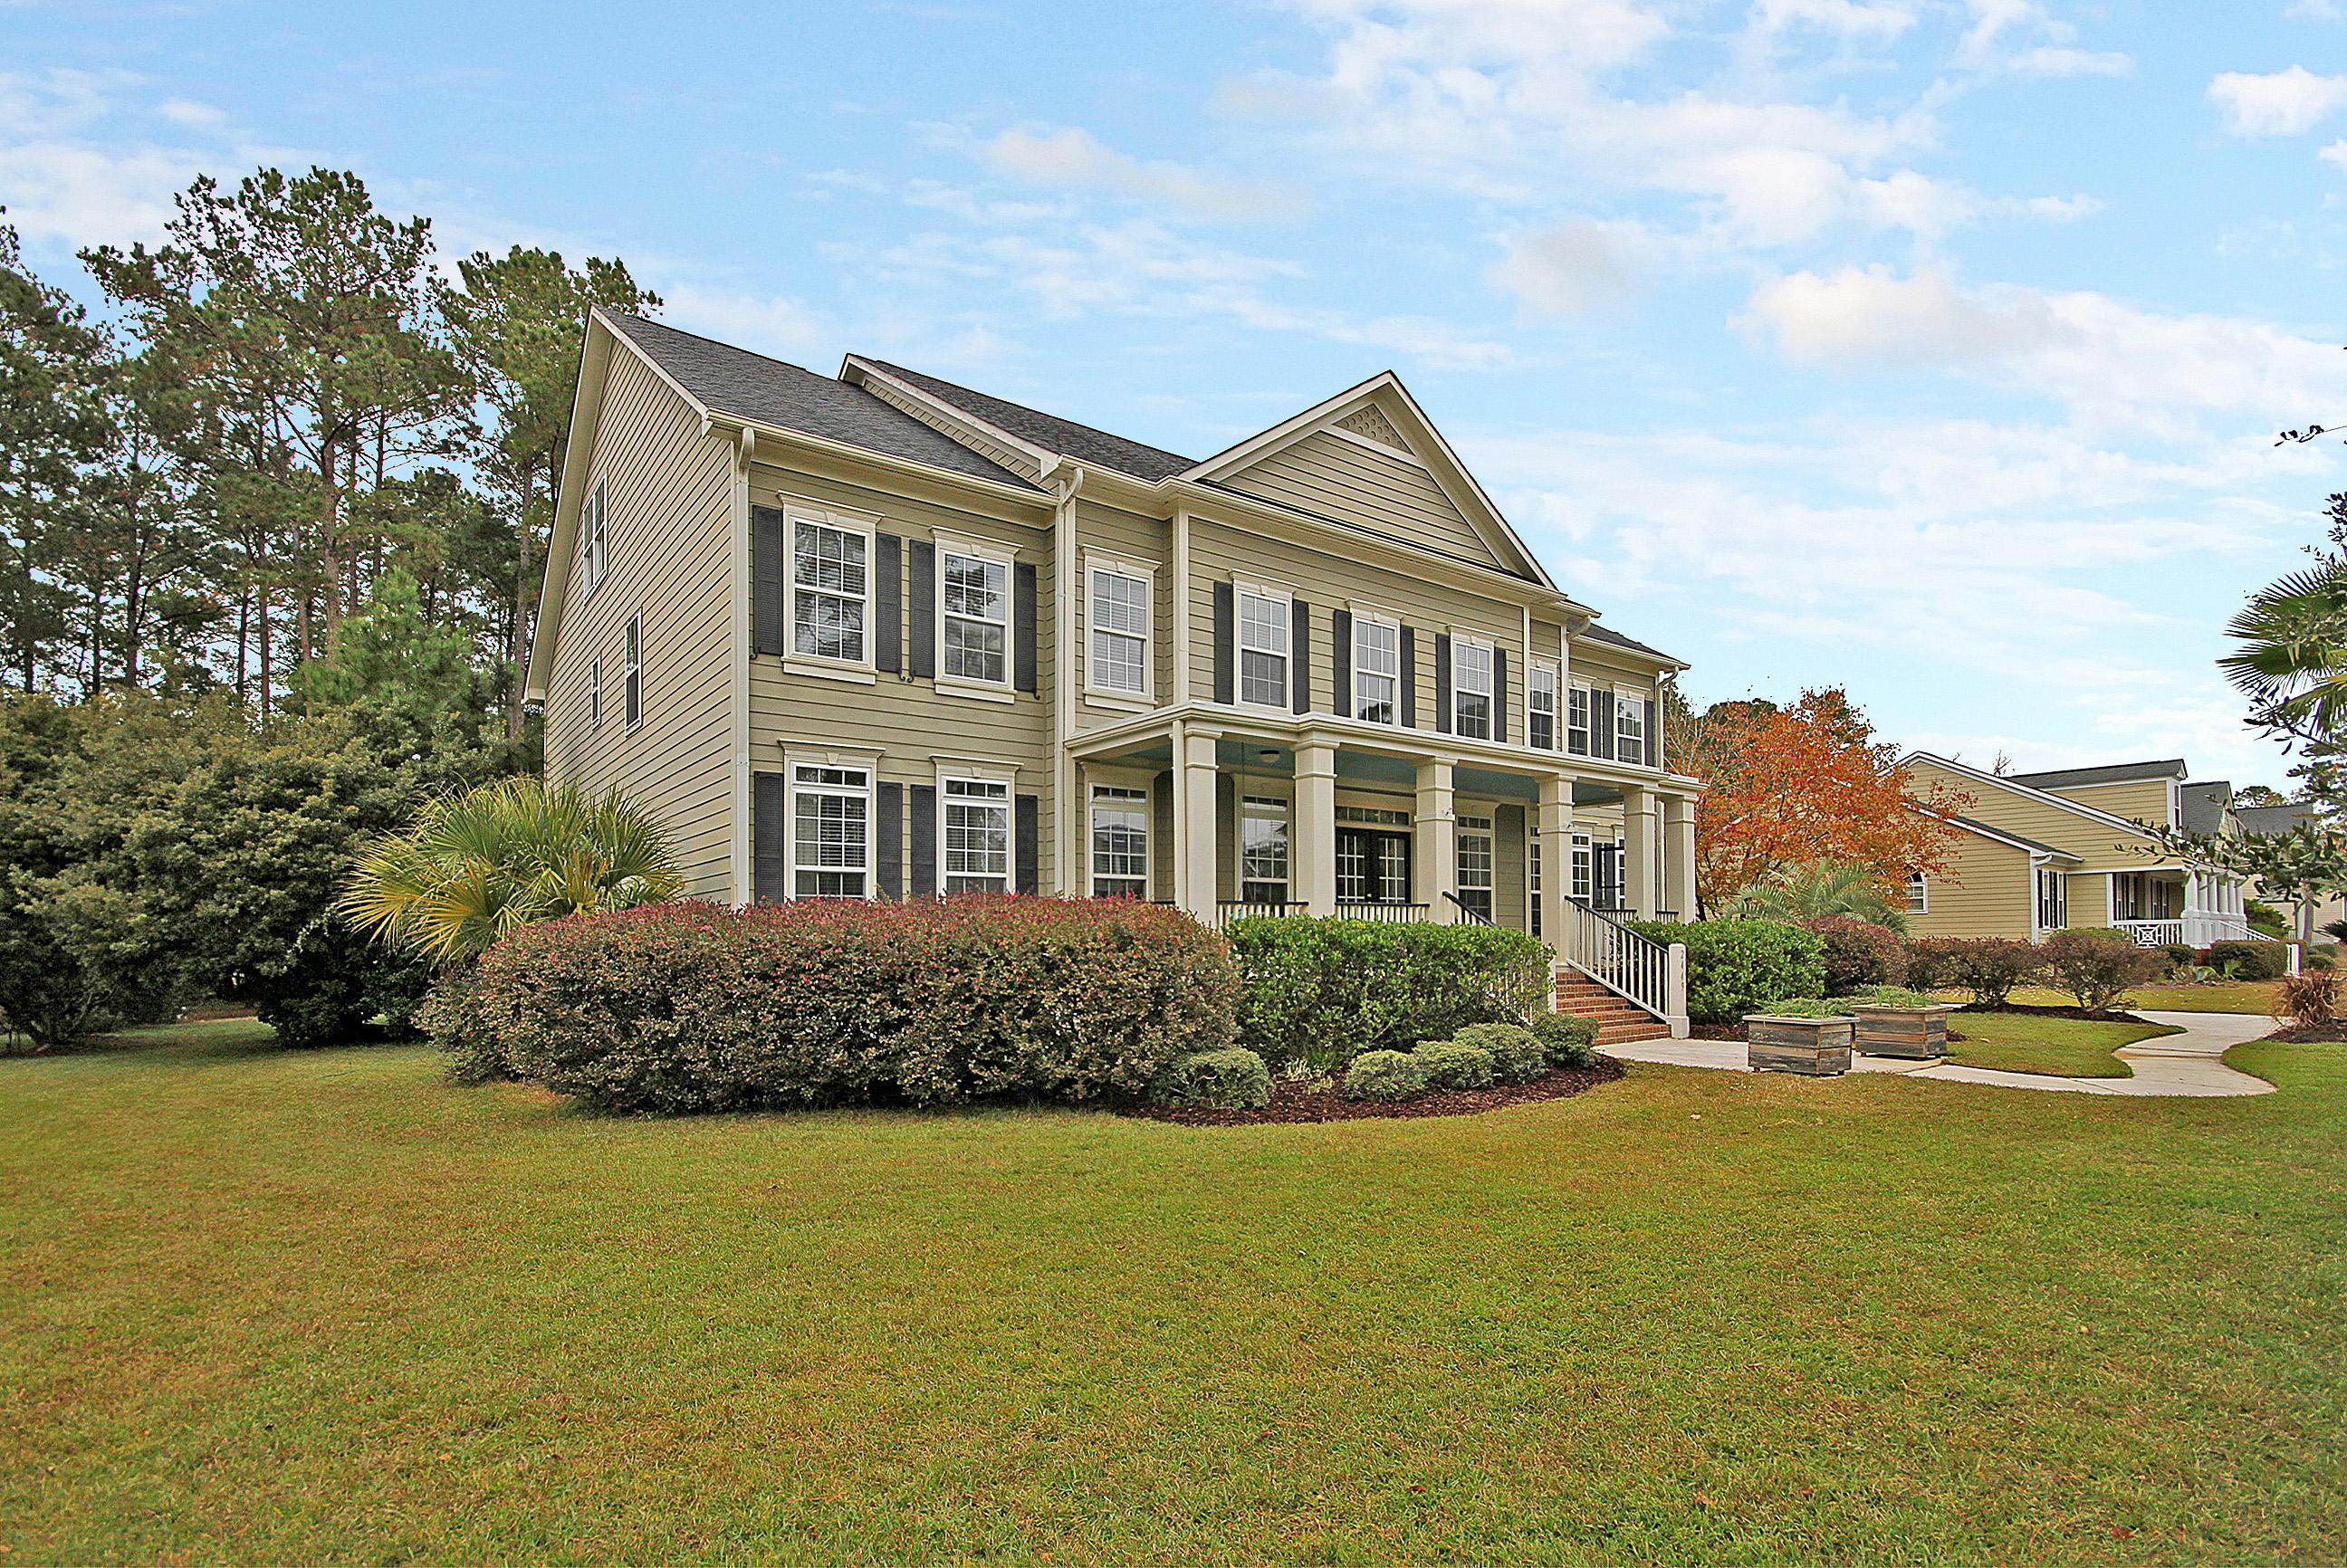 Dunes West Homes For Sale - 2449 Darts Cove, Mount Pleasant, SC - 34